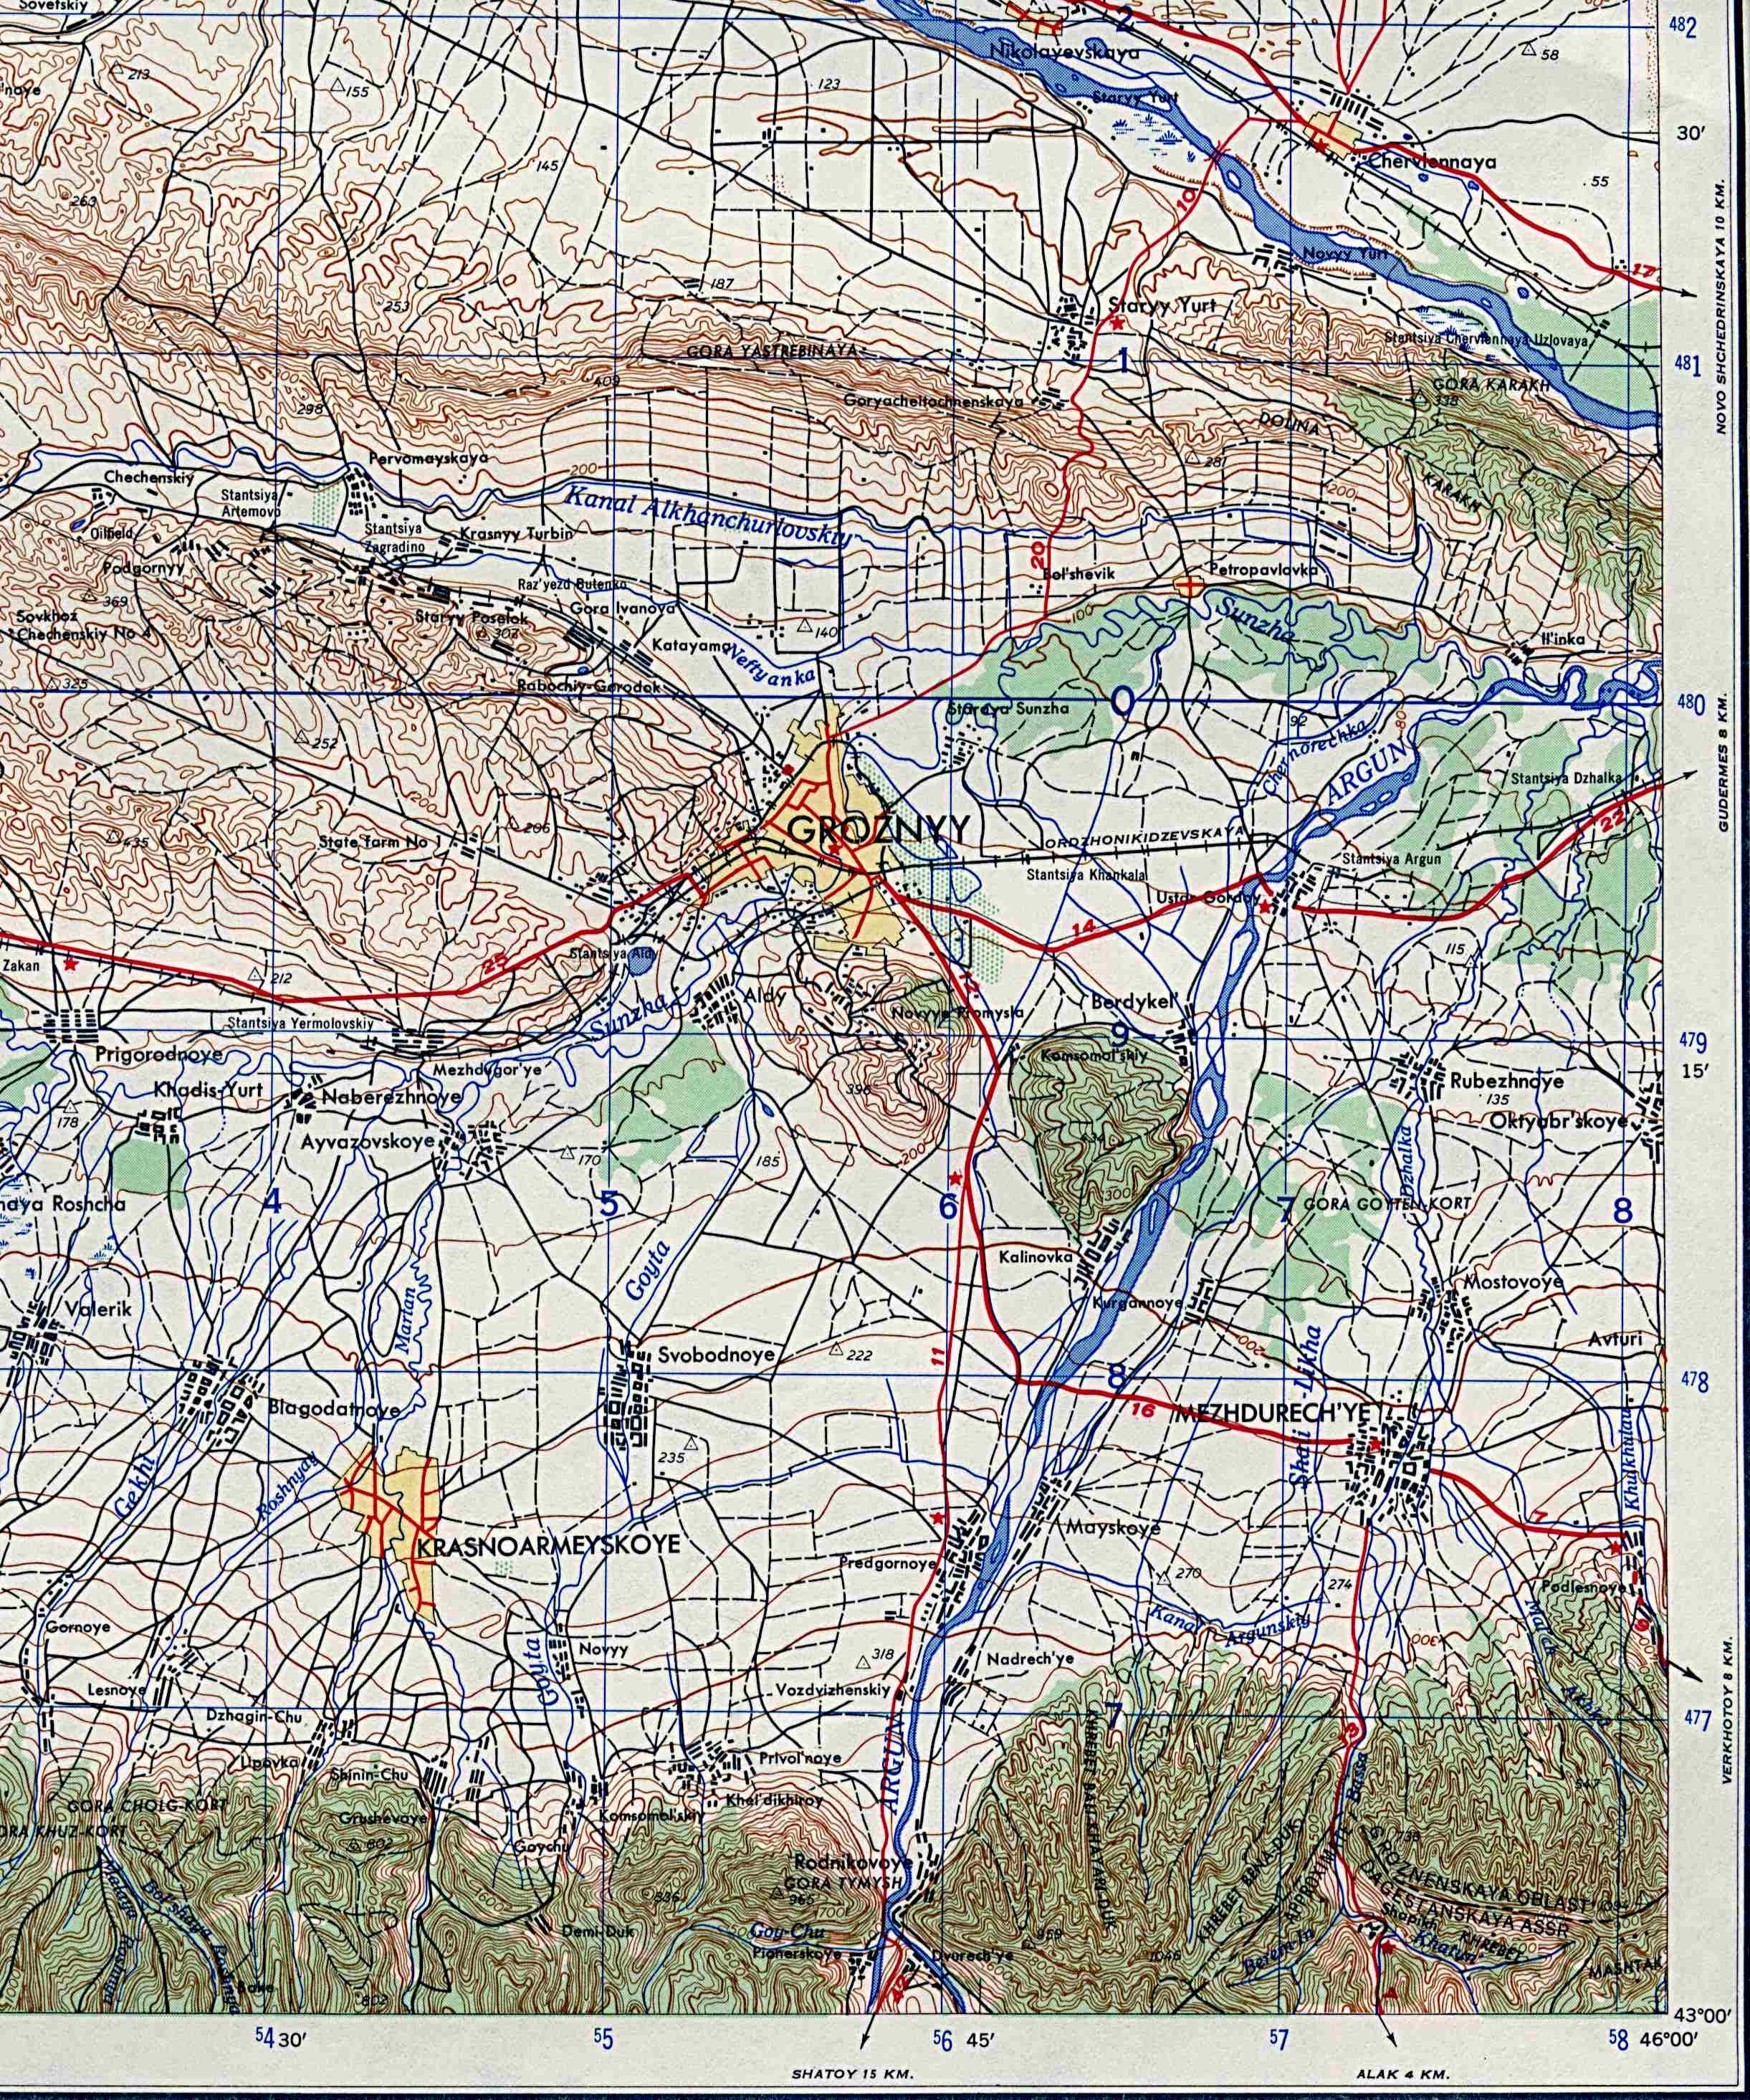 Chechnya (Chechen Republic) Maps - Perry-Castañeda Map ... on azerbaijan map, armenia map, serbia map, russia map, north korea map, second chechen war, ramzan kadyrov, slovenia map, shamil basayev, caucasus map, beslan school hostage crisis, pakistan map, chechen people, kyrgyzstan map, novaya zemlya map, kalmykia map, uzbekistan map, saint petersburg, first chechen war, dagestan map, caucasus mountains, grozny map, siberia map, slovakia map, moscow map, ukraine map, europe map, north caucasus, georgia map, moscow theater hostage crisis,